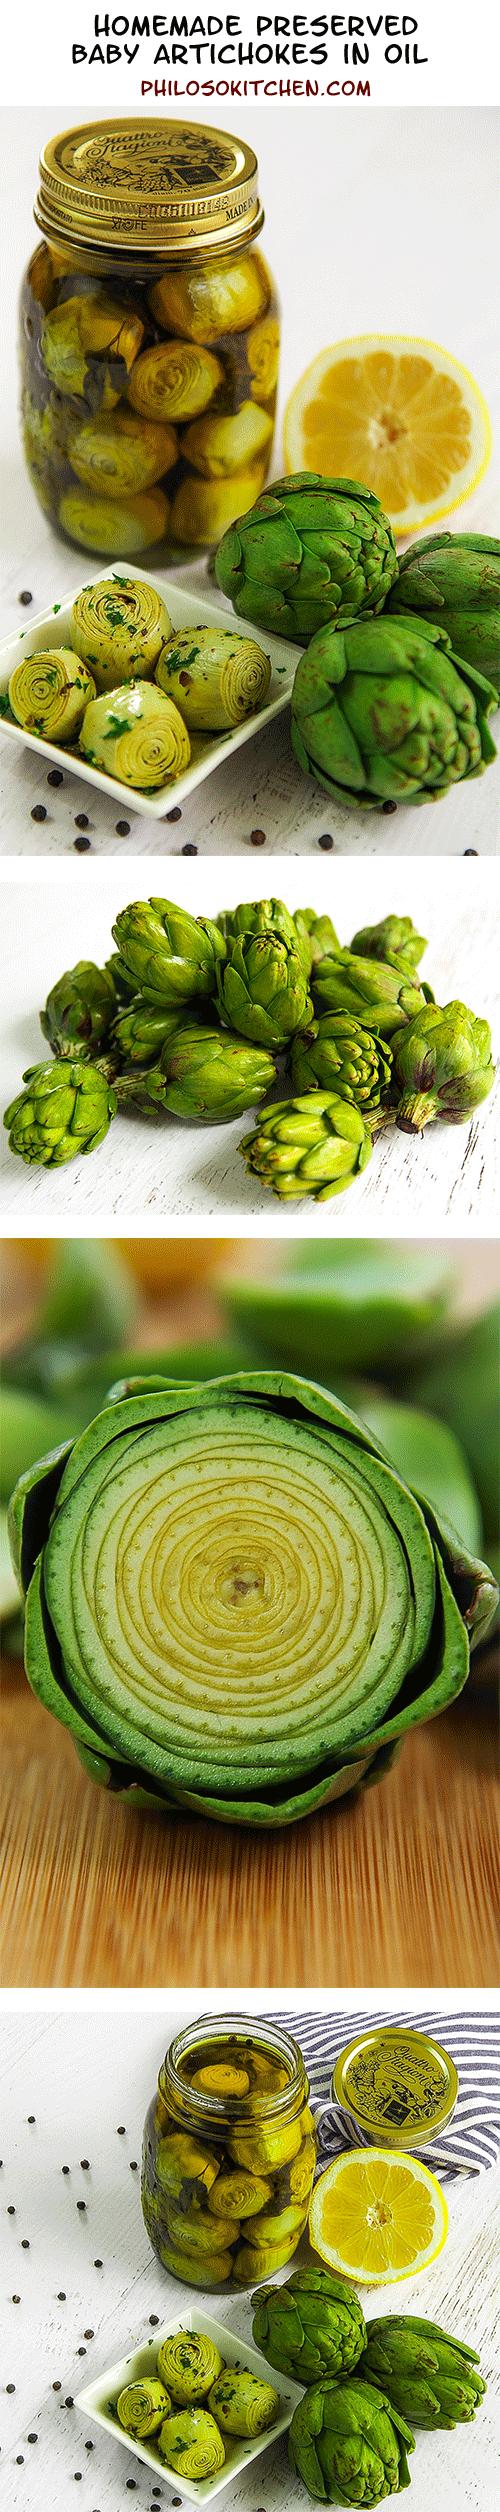 homemade preserved baby artichokes